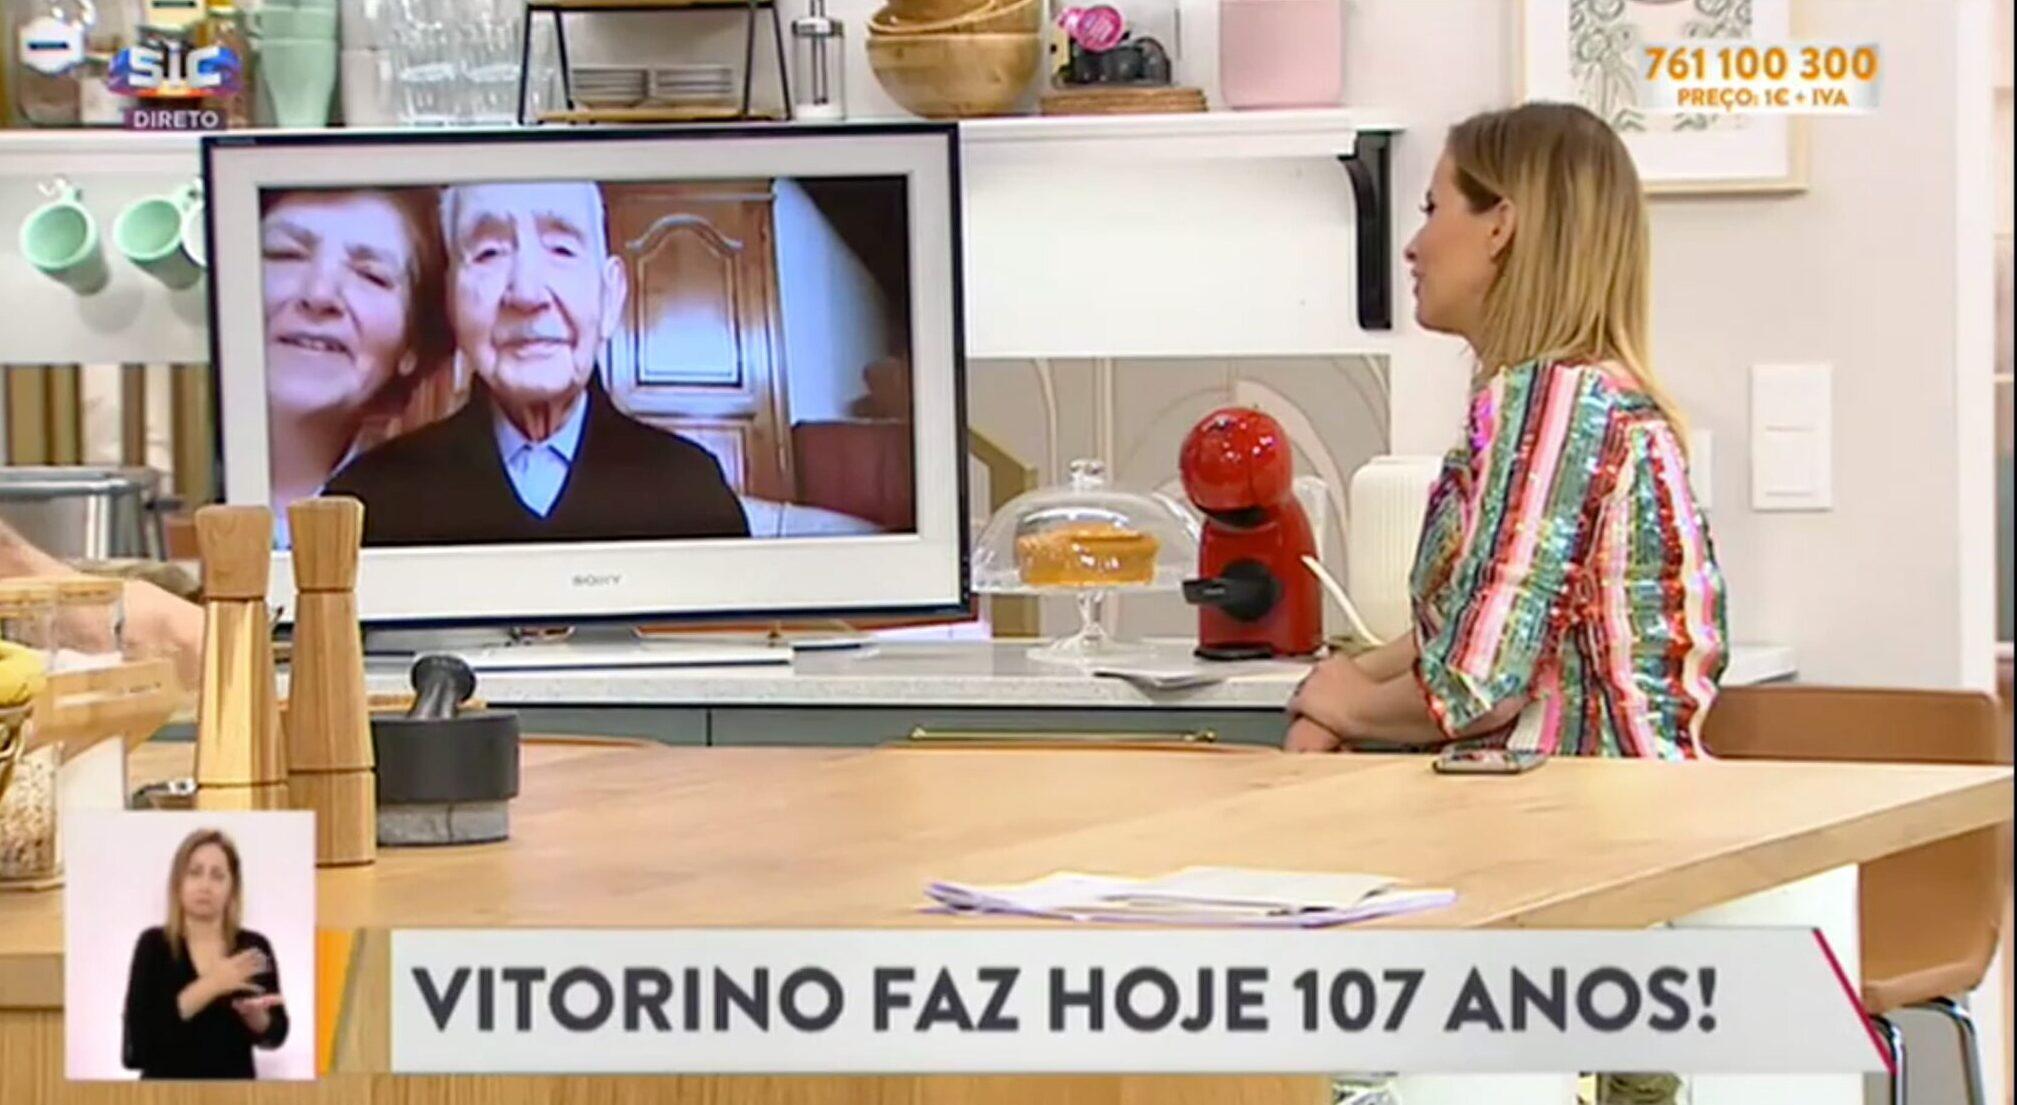 Cristina Ferreira Senhor Vitorino 107 Anos Scaled E1586209184893 Senhor Vitorino De 107 Anos Conquista Coração De Cristina Ferreira